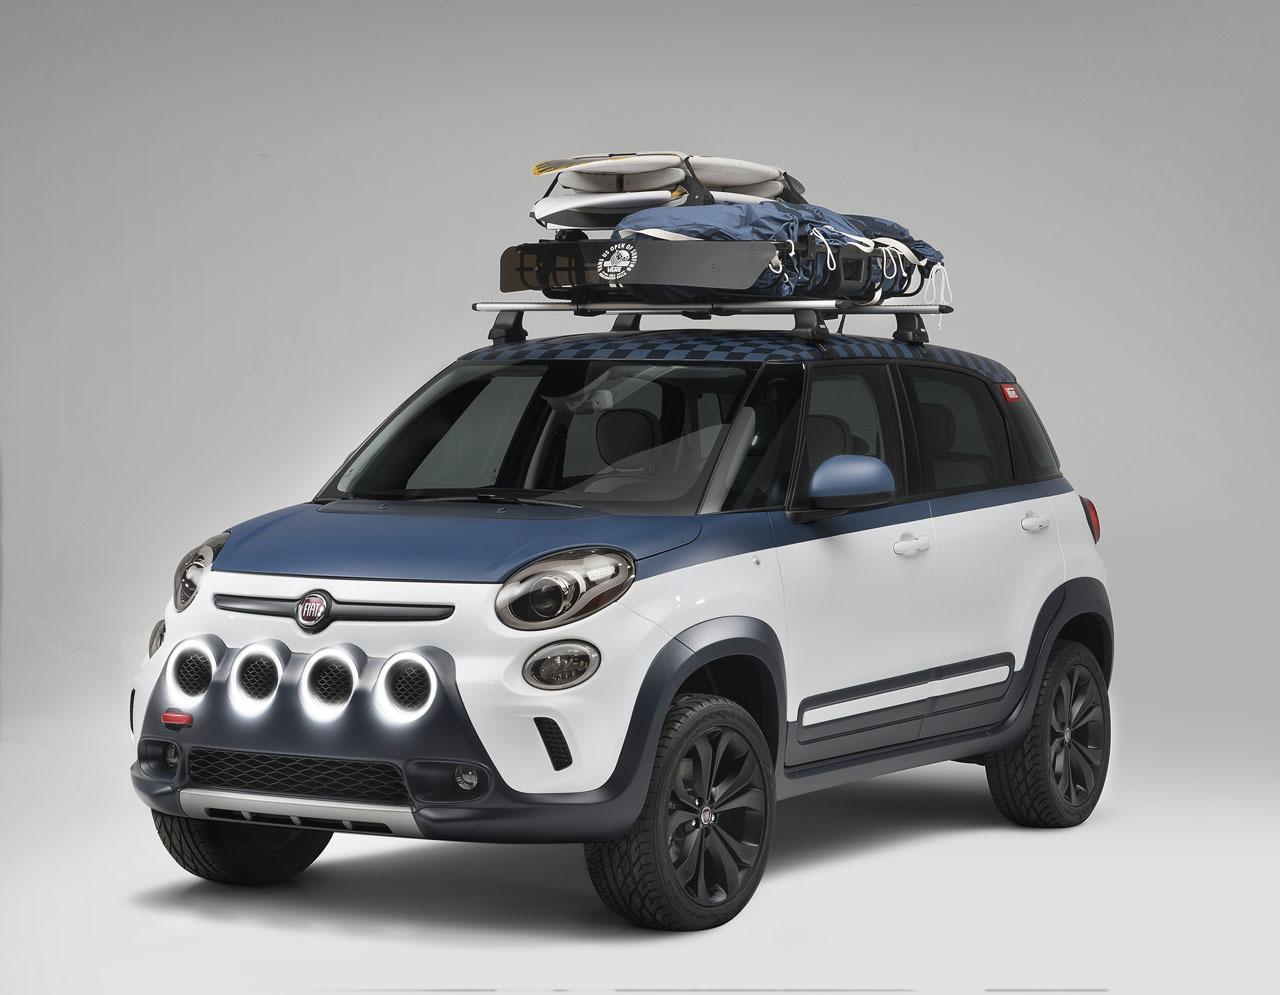 Fiat 500 L, Vans Concept, Fiat 500 L Vans Concept, Concept Car, Freizeit, spaß,  Sneaker, Vans Sneaker, Fiat, Fiat 500, Fiat 500L, Surfer, Vans US Open of Surfing